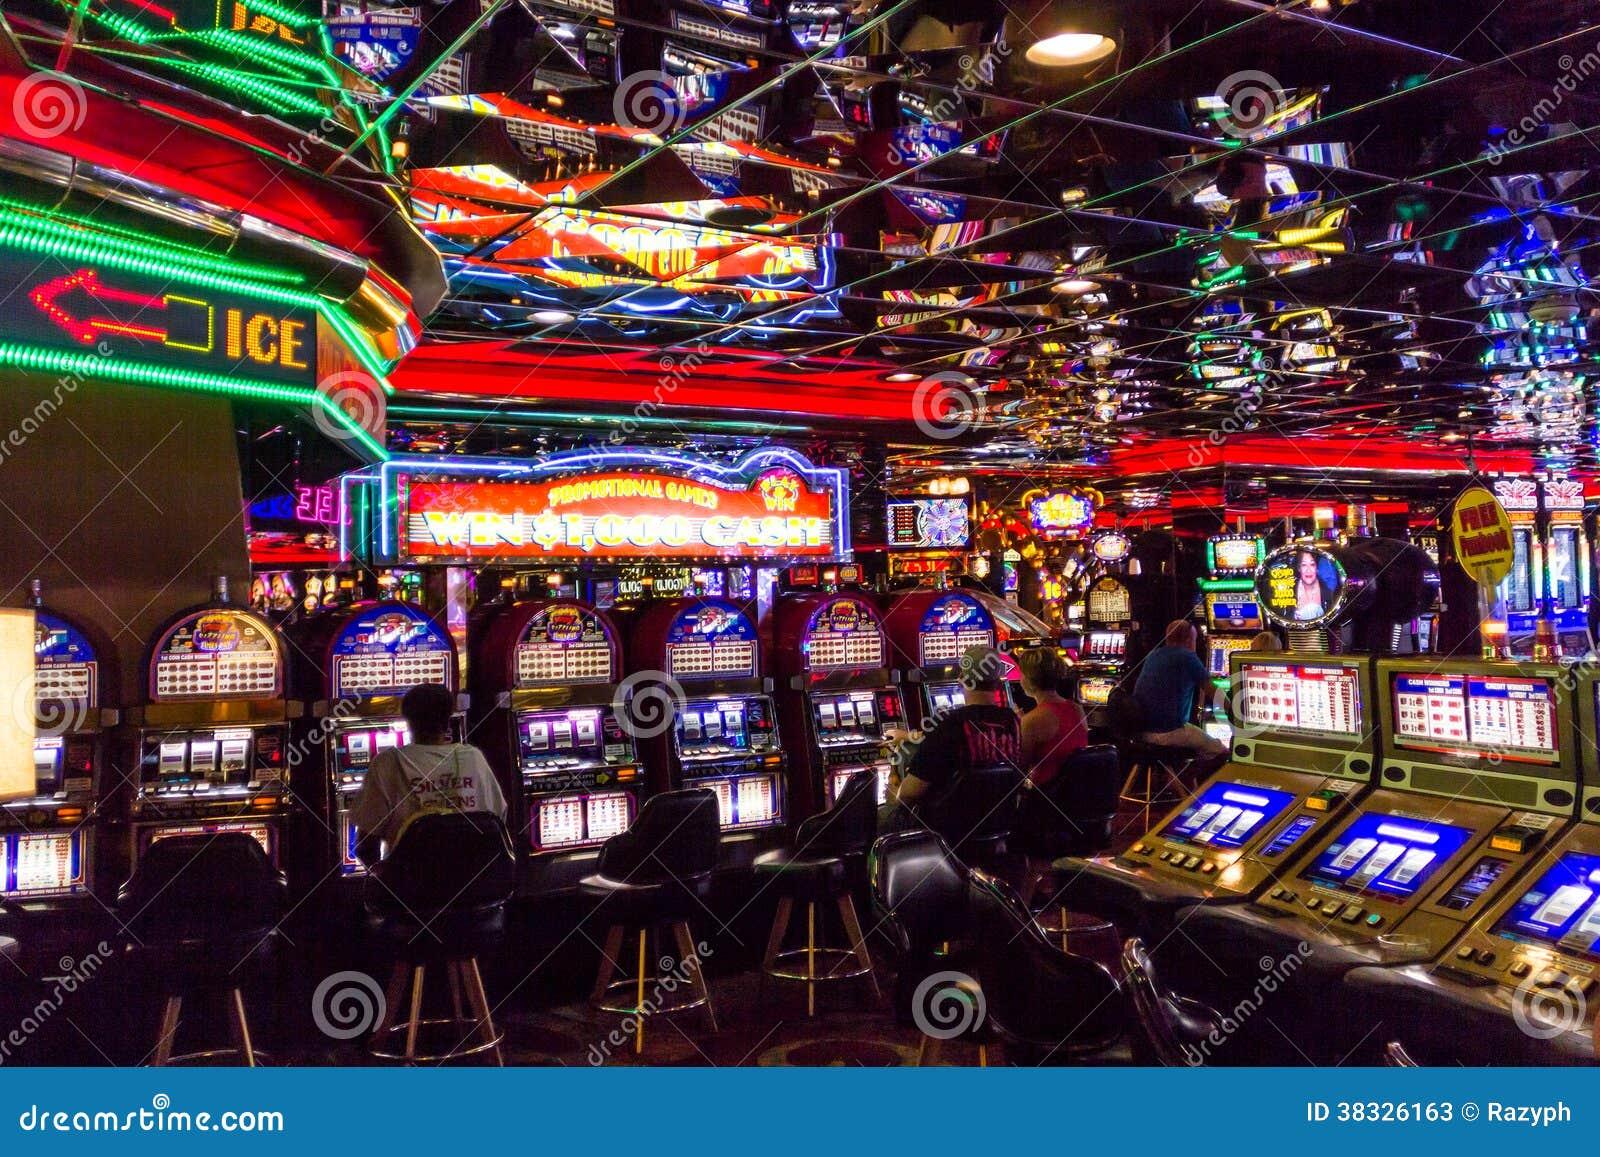 Jugadores de maquinas tragamonedas jugar con Coimbra - 86483